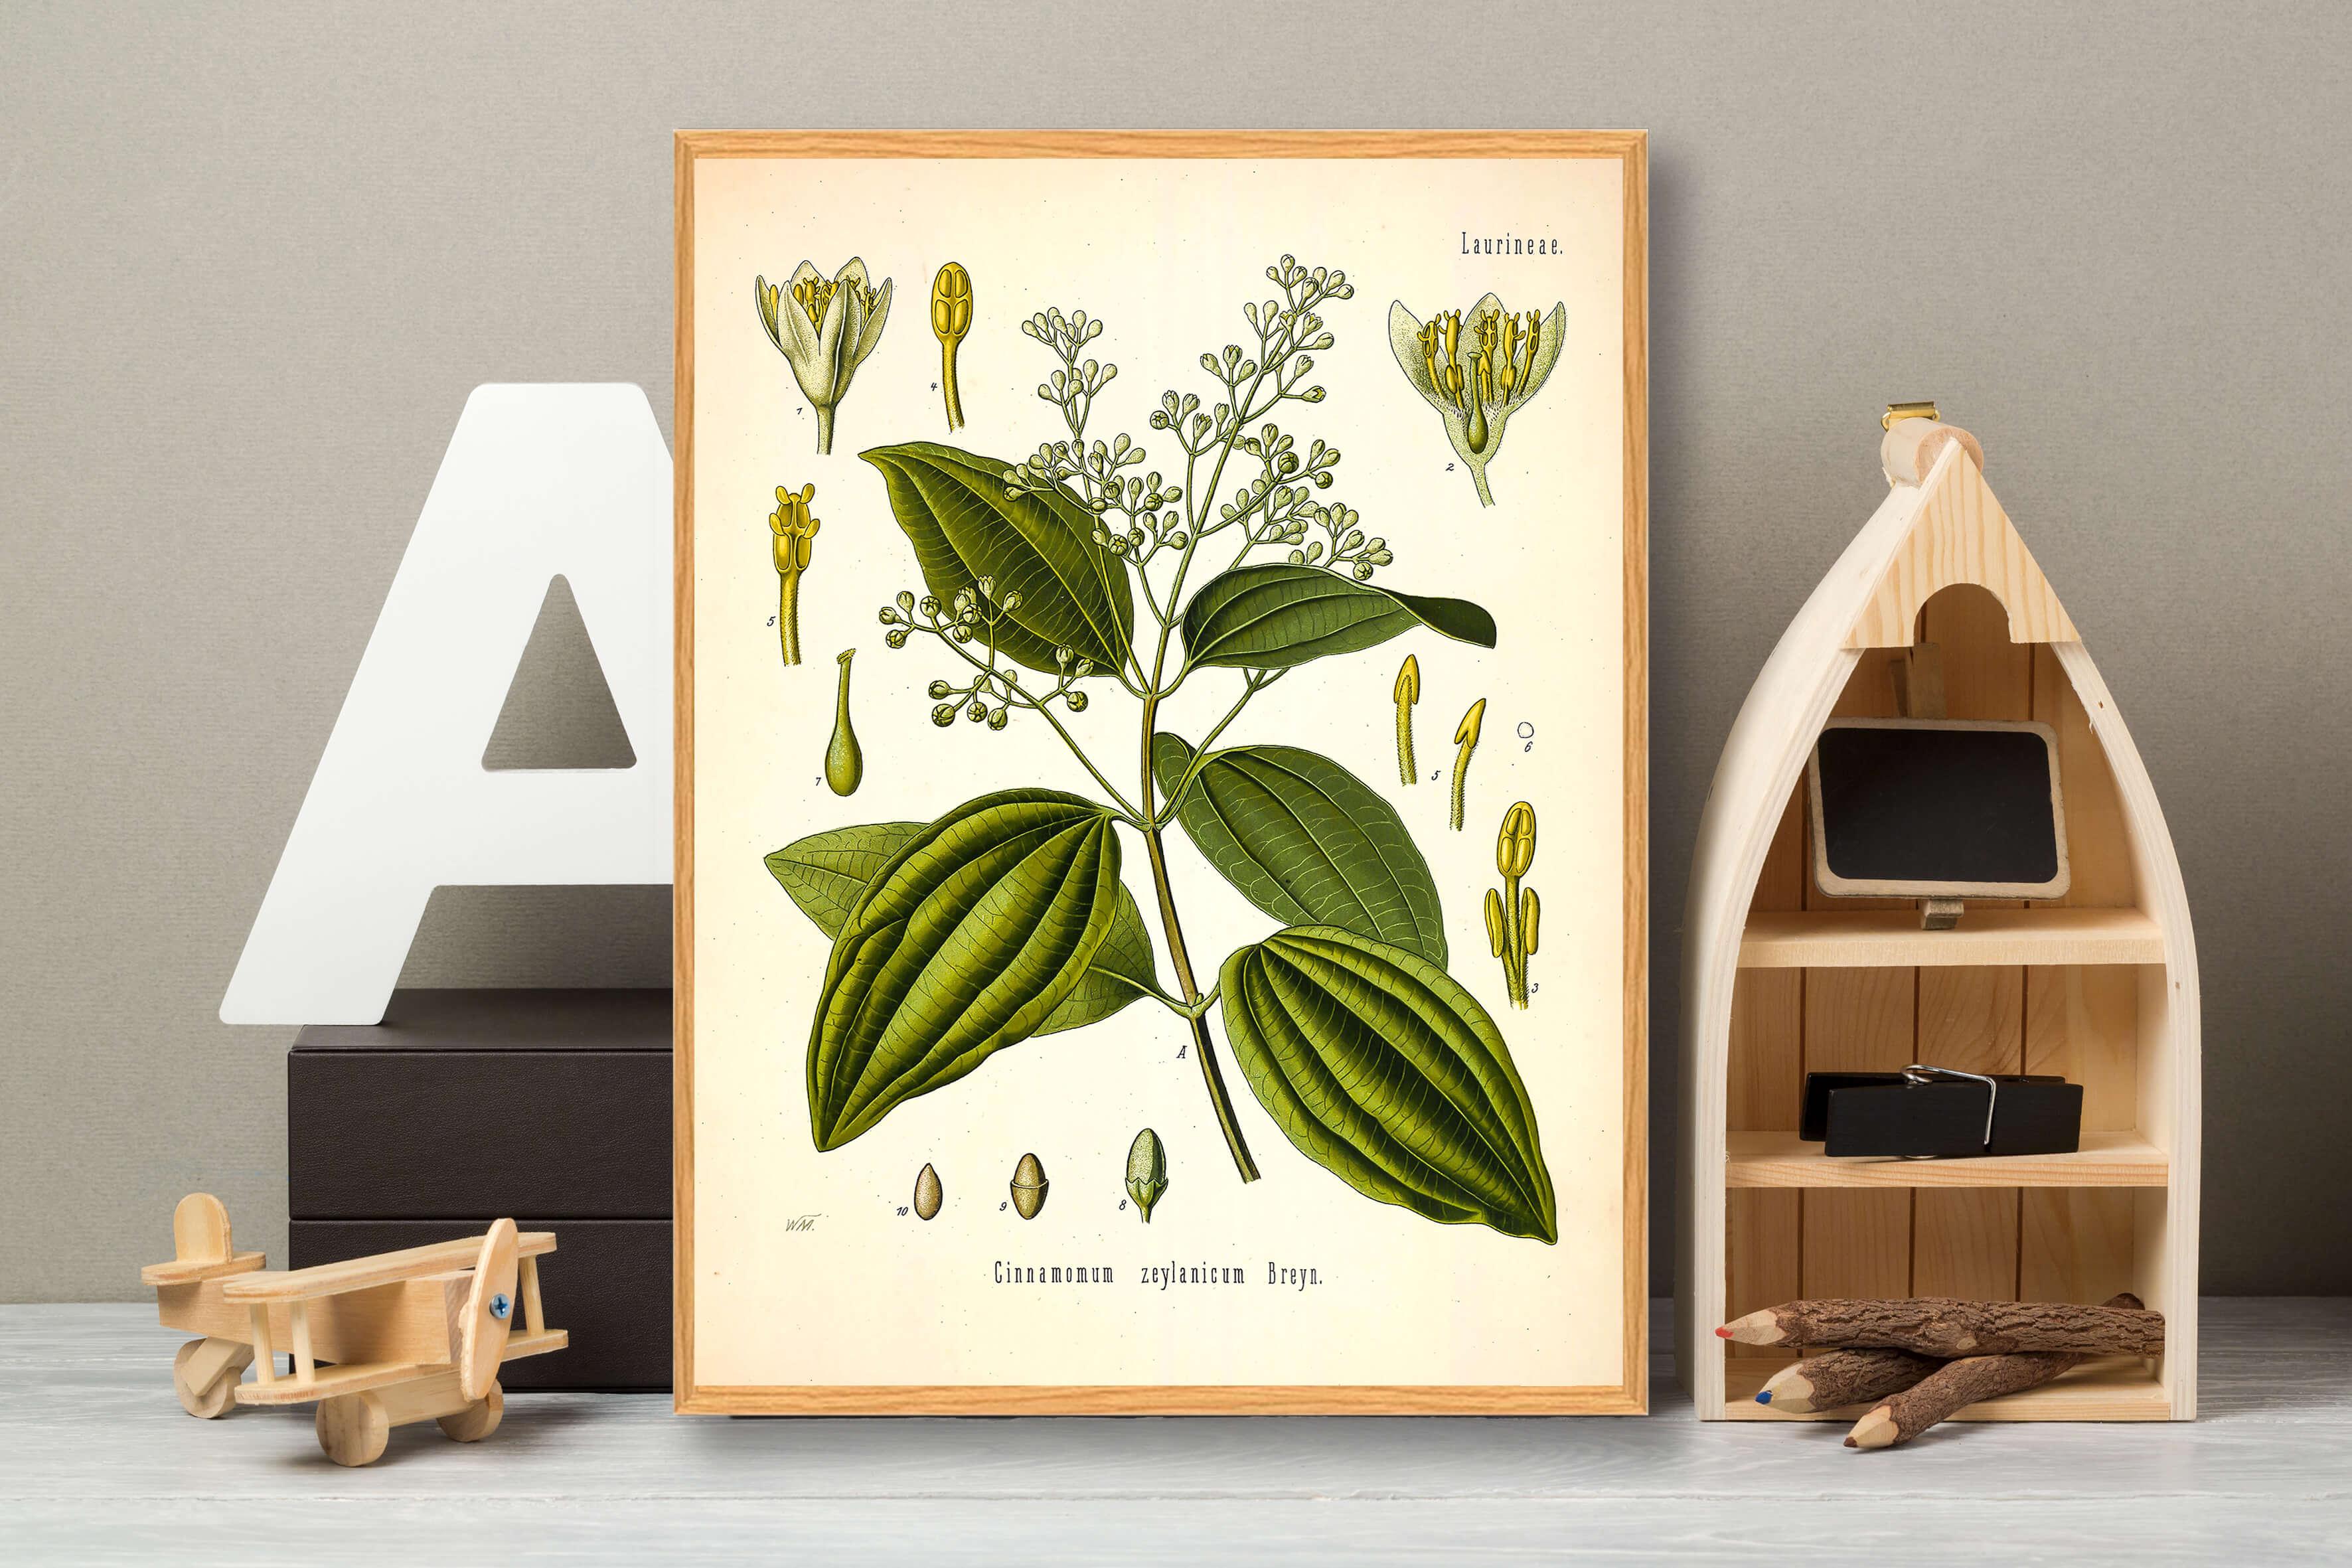 kanelplante-plakat-3